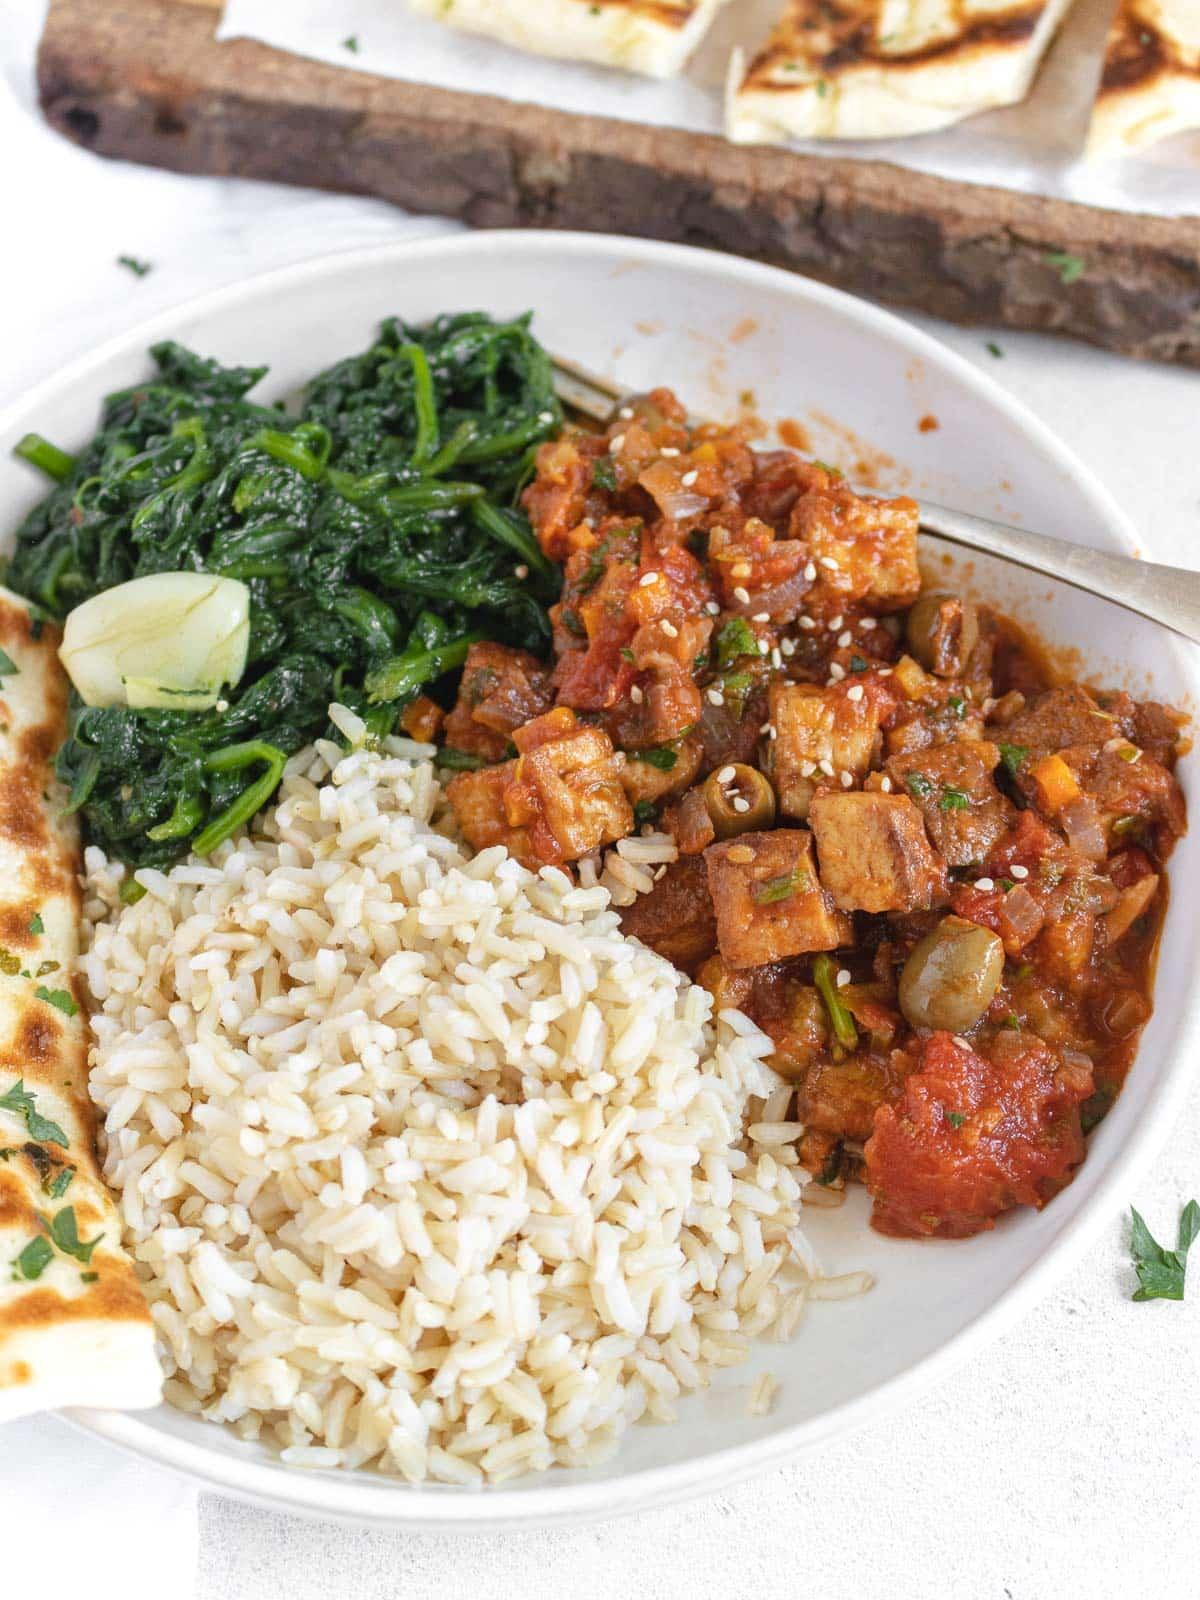 tofu cacciatore with flatbread, rice and spinach